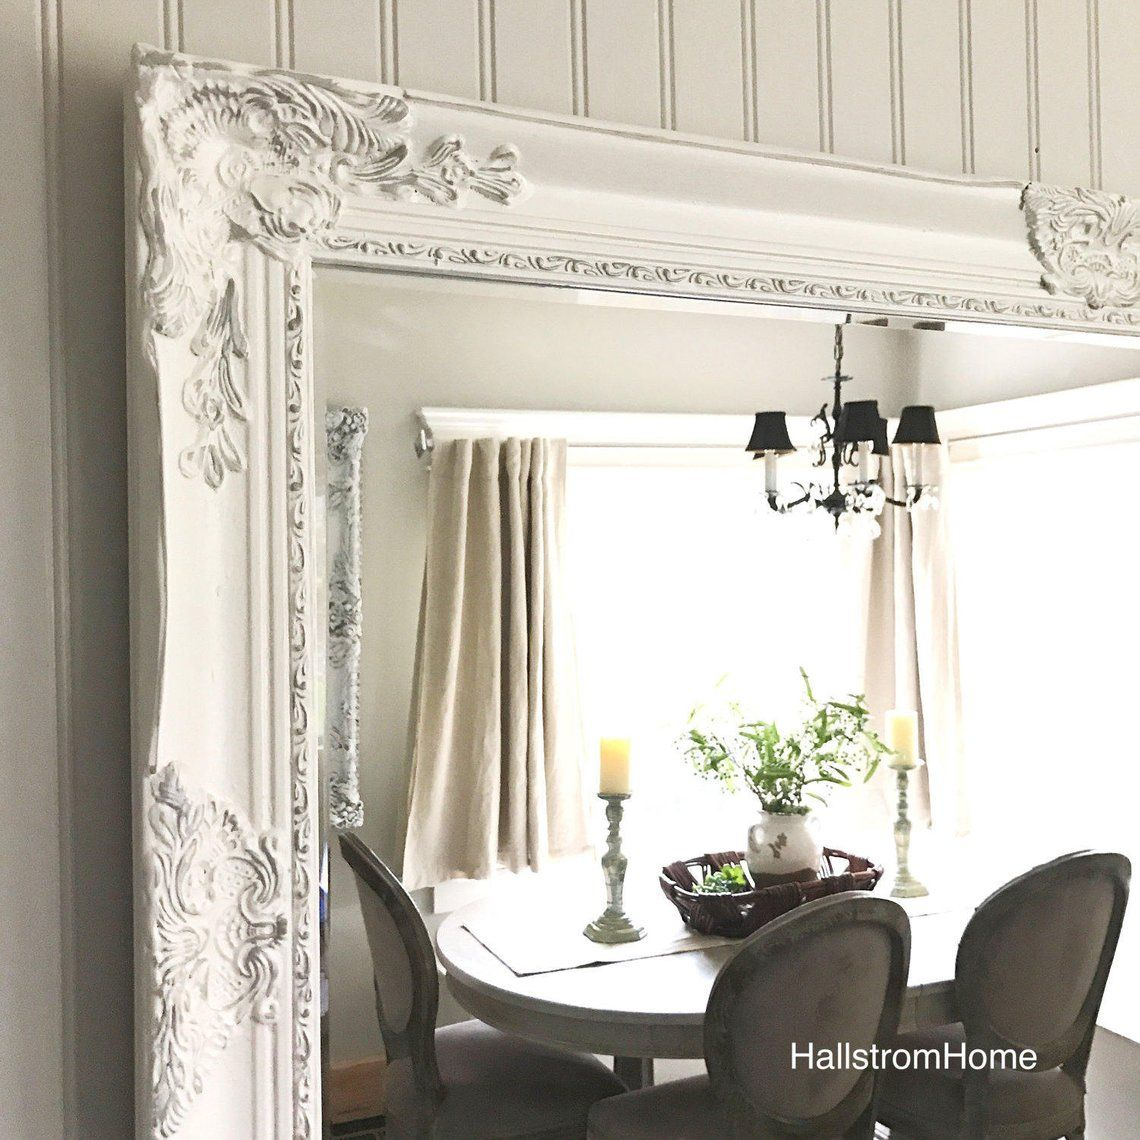 Farmhouse mirror large shabby chic decor bathroom mirror